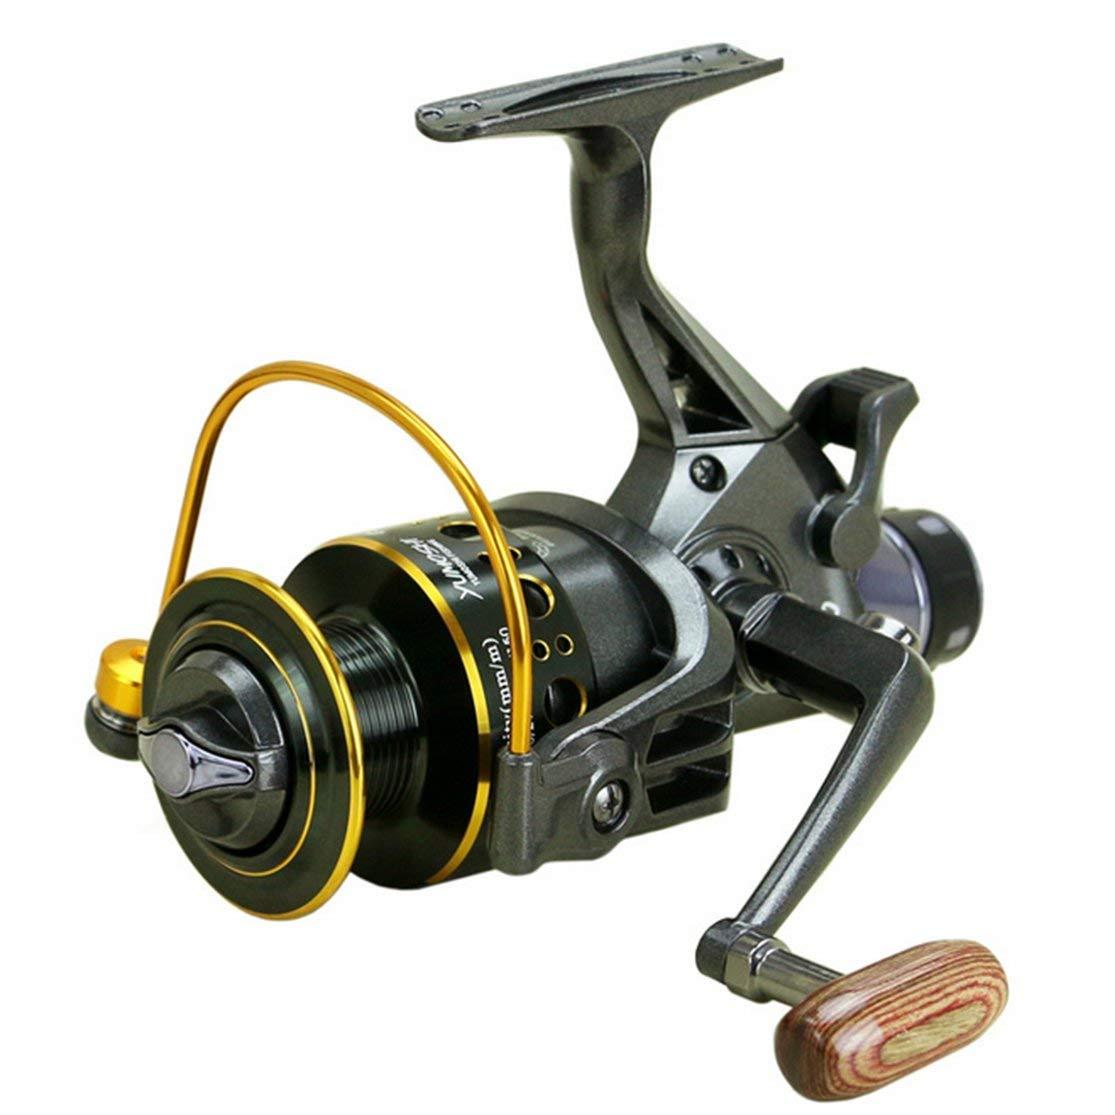 Quanna YUMOSHI Fishing Reel 10+1 Ball Bearings Front Rear Dual Brake System Metal Coil Bait Casting Fishing Reel for Outdoor Fishing by Quanna